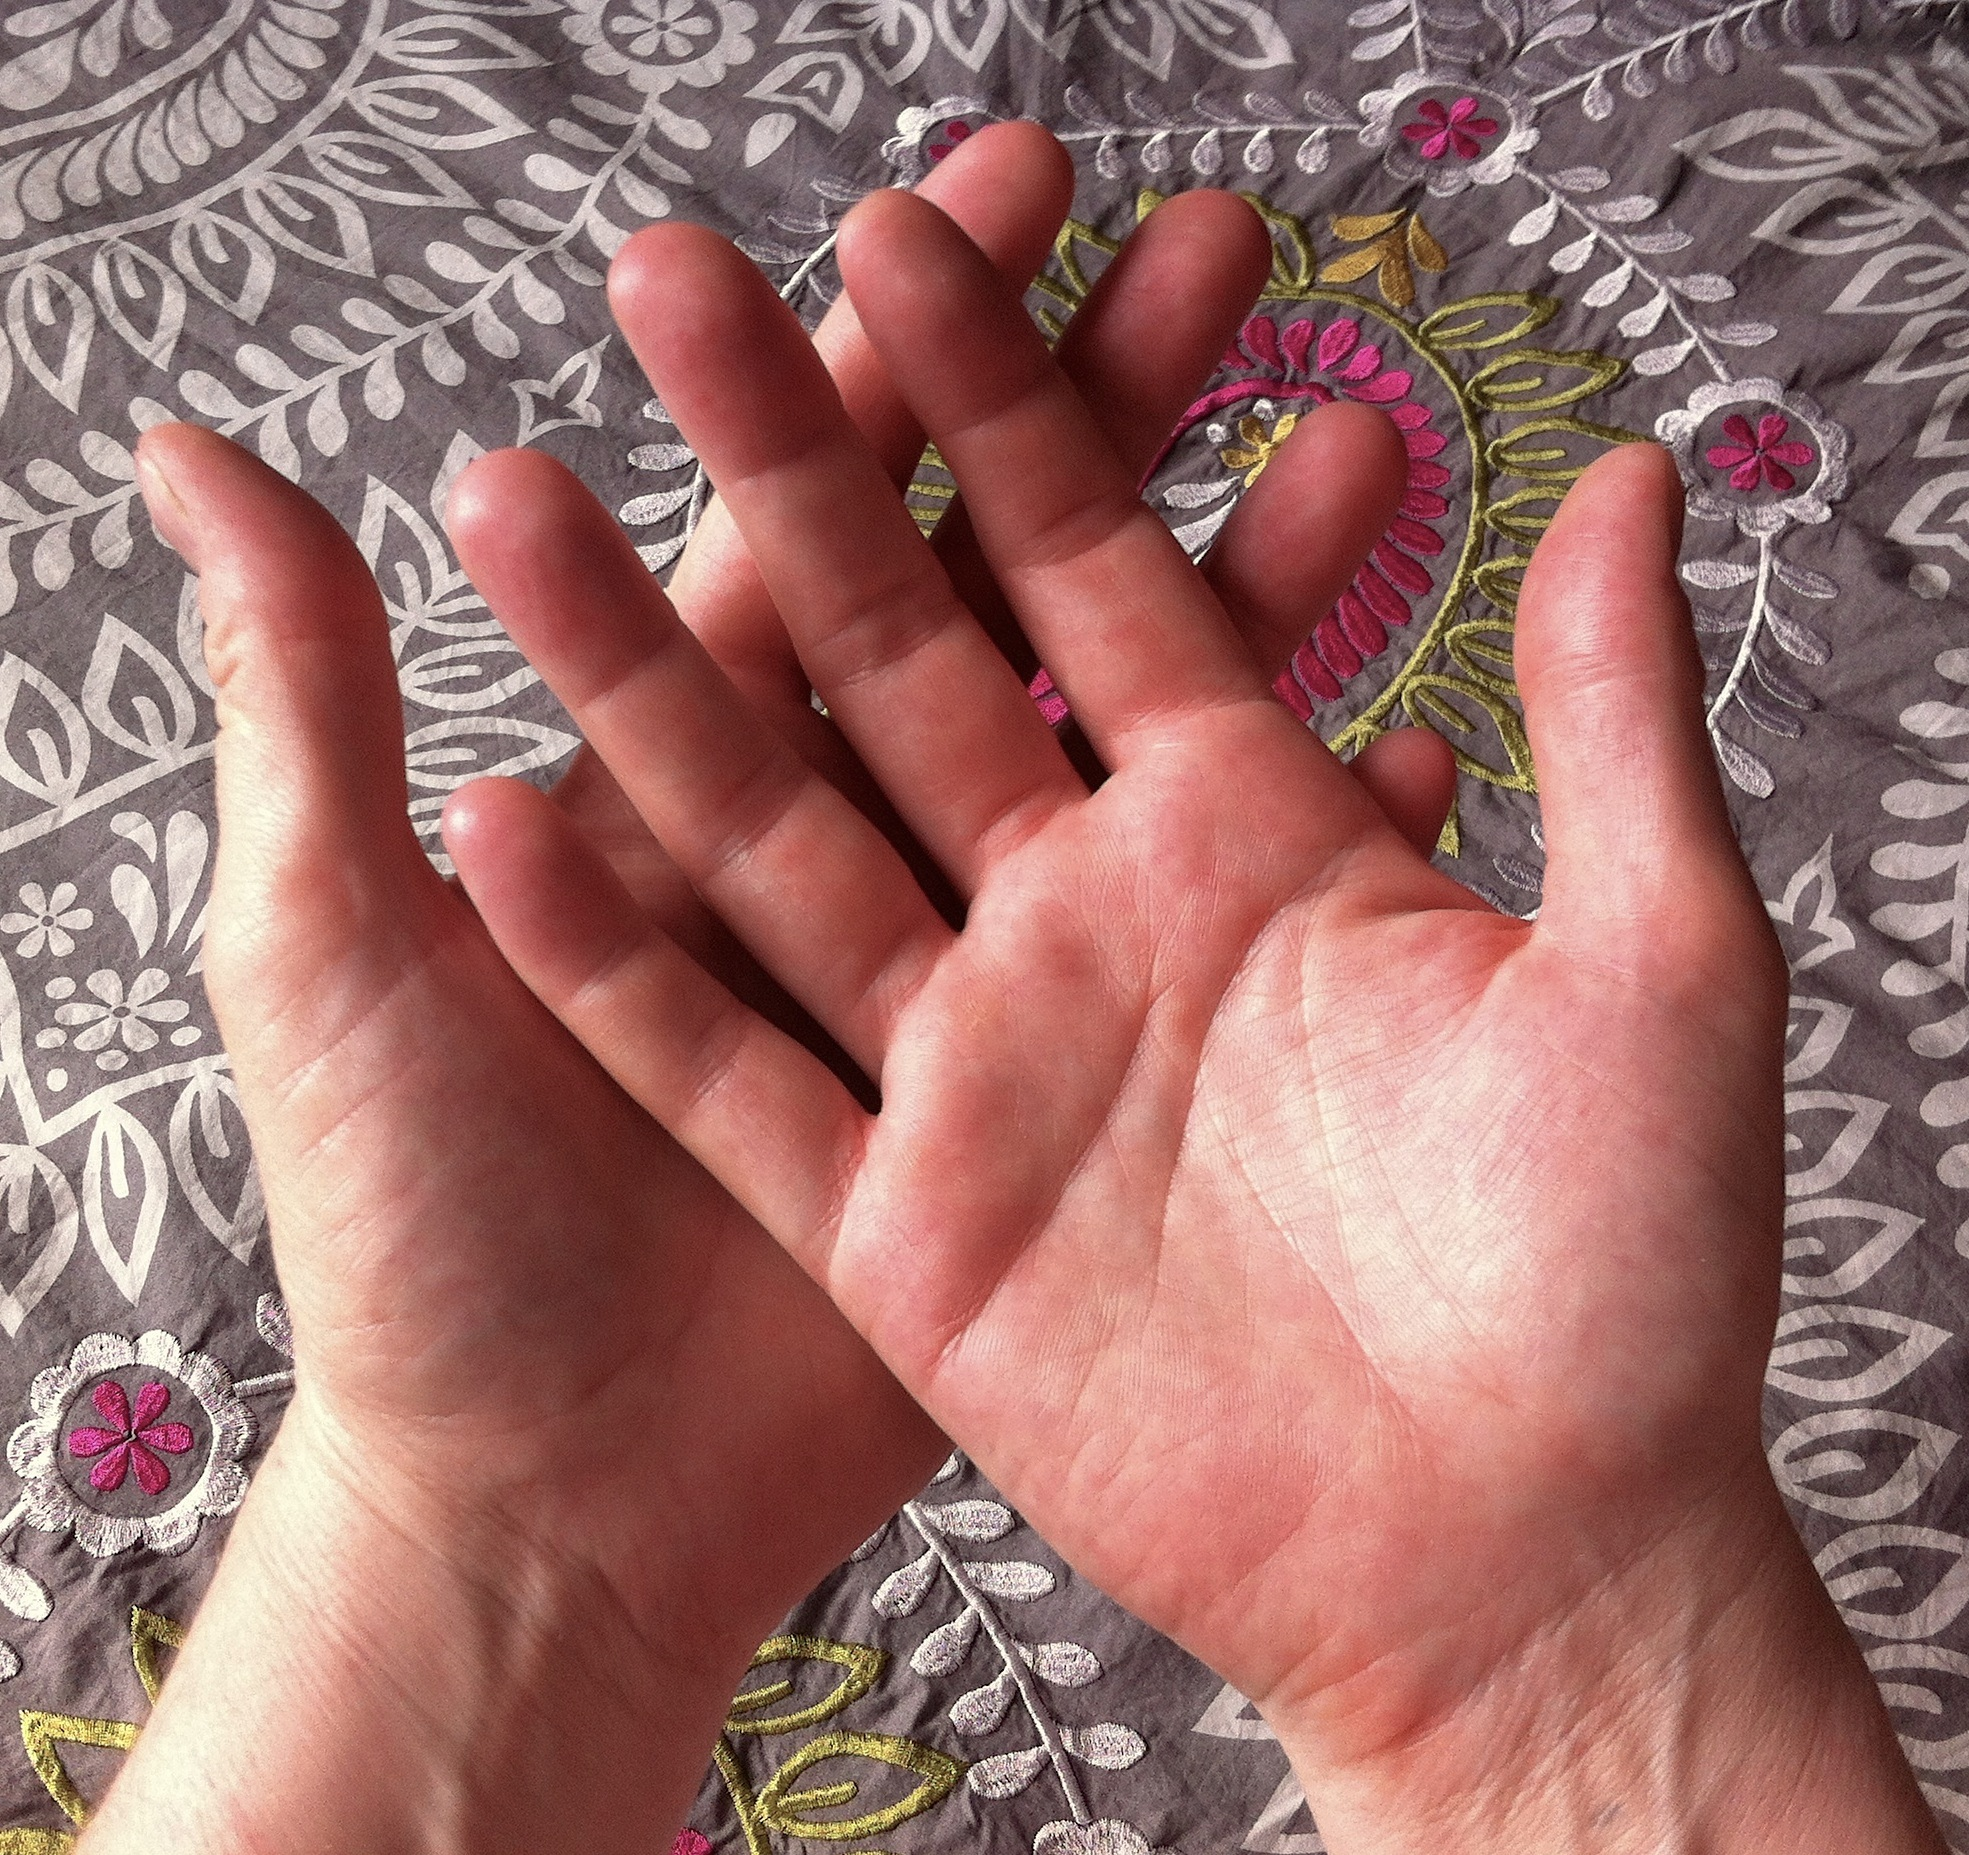 My loving hands